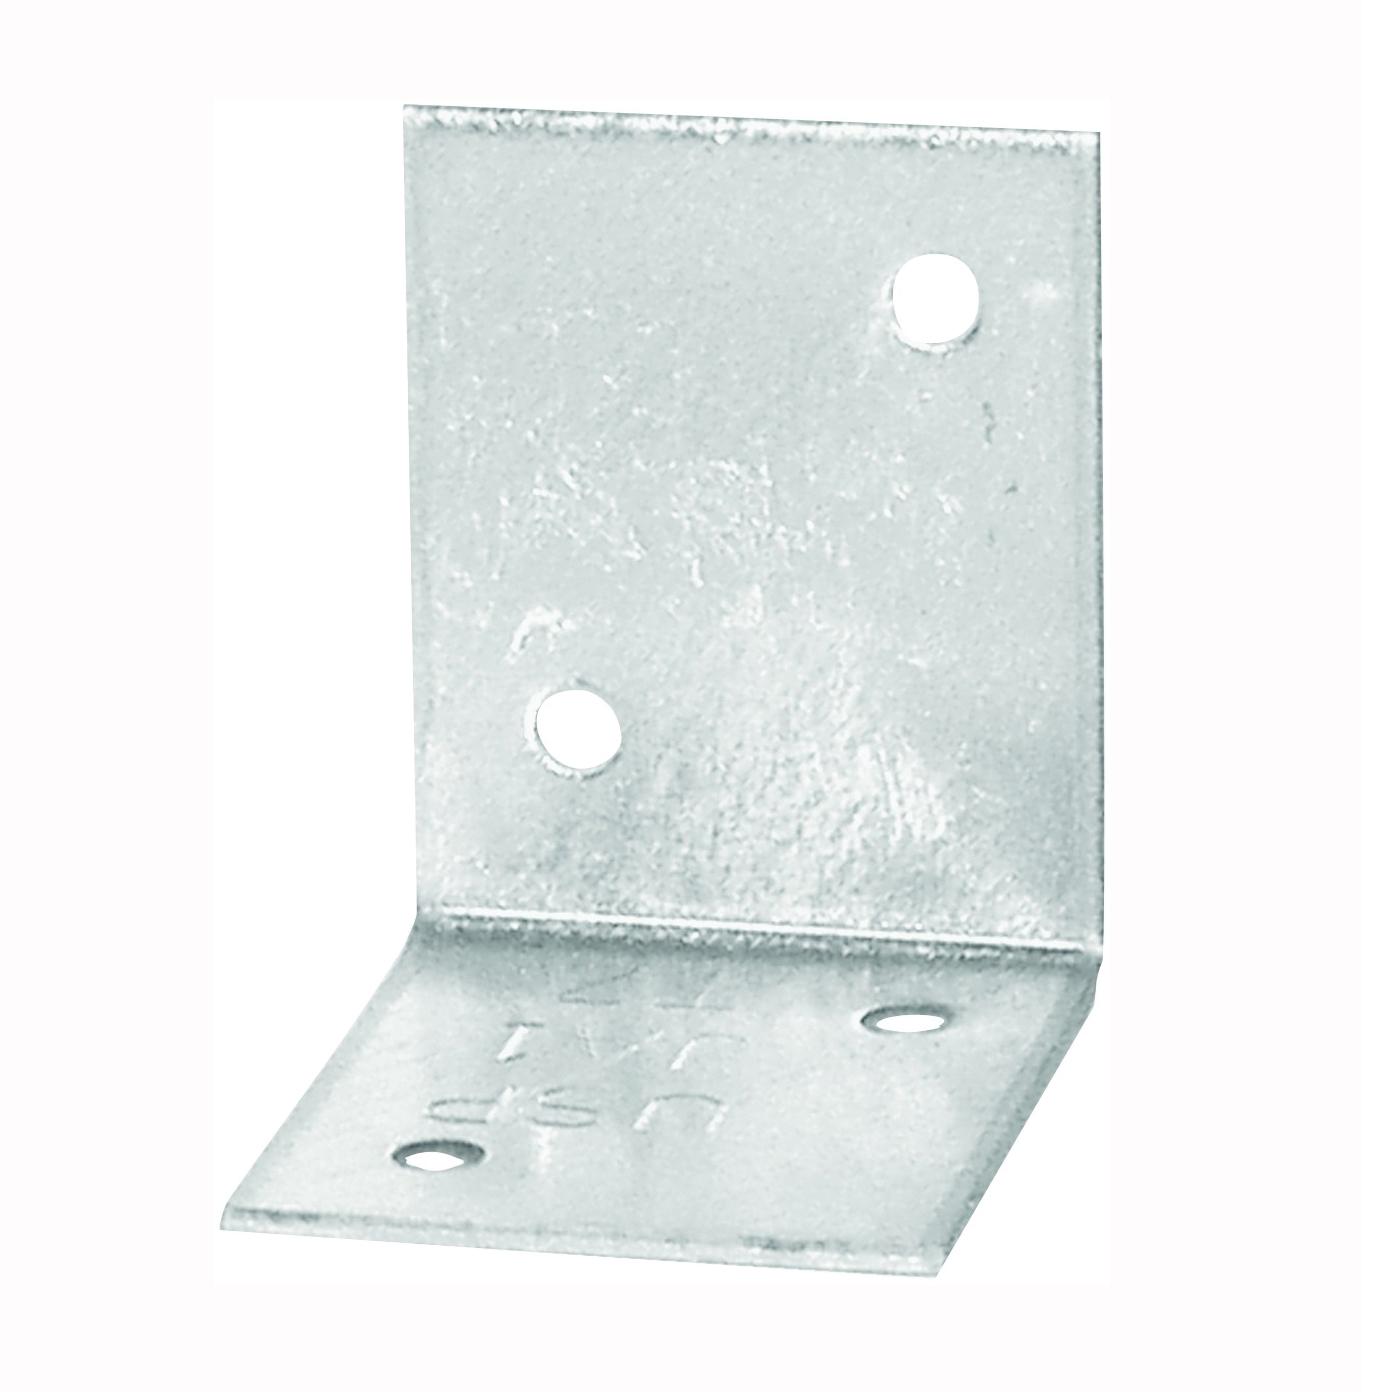 Picture of MiTek JA1-TZ Framing Angle, 1-1/2 in W, 1-1/2 in D, 1-1/4 in H, Steel, Zinc